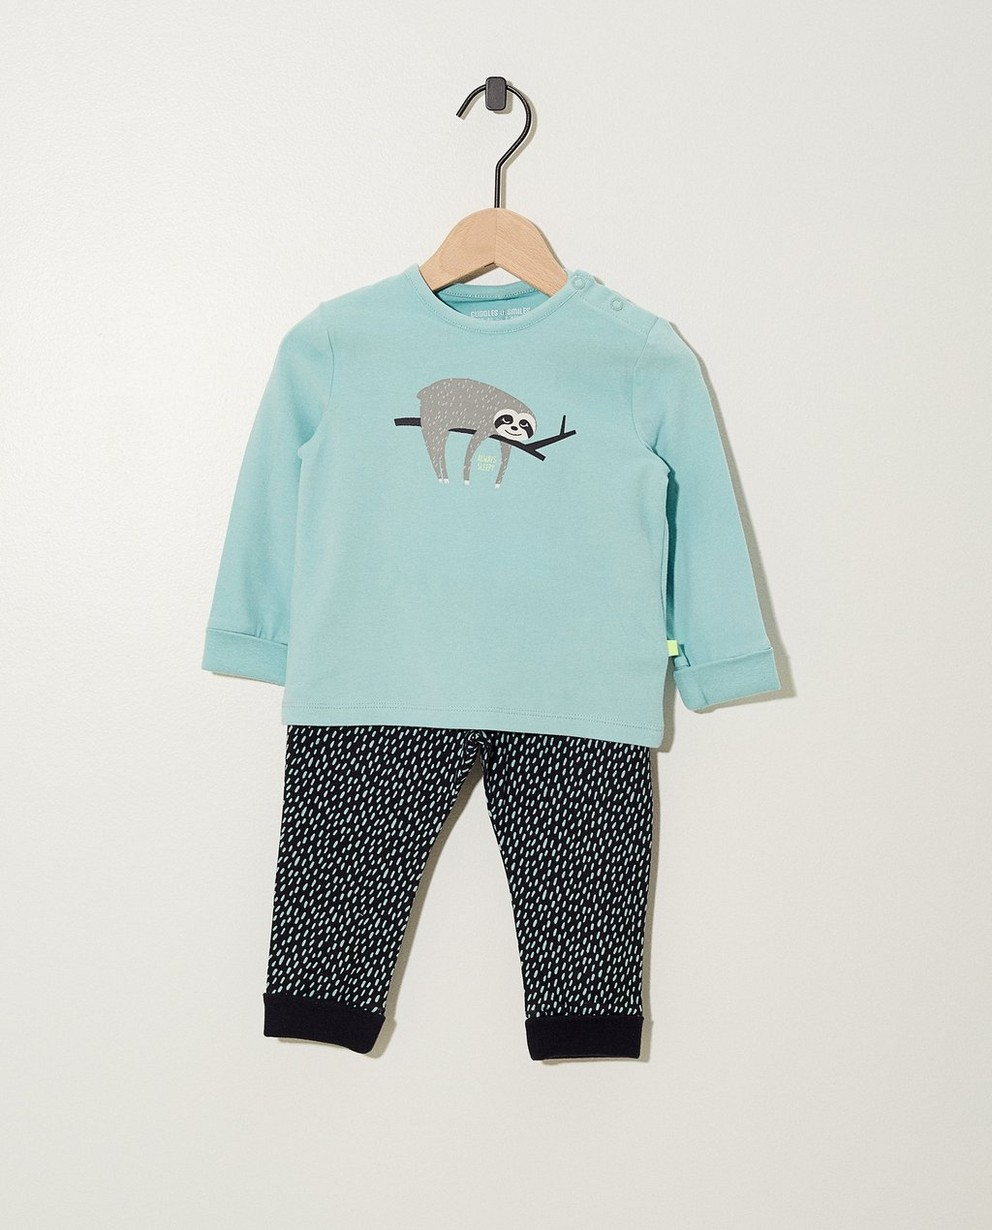 Meegroei pyjama in biokatoen - meegroei - cudd